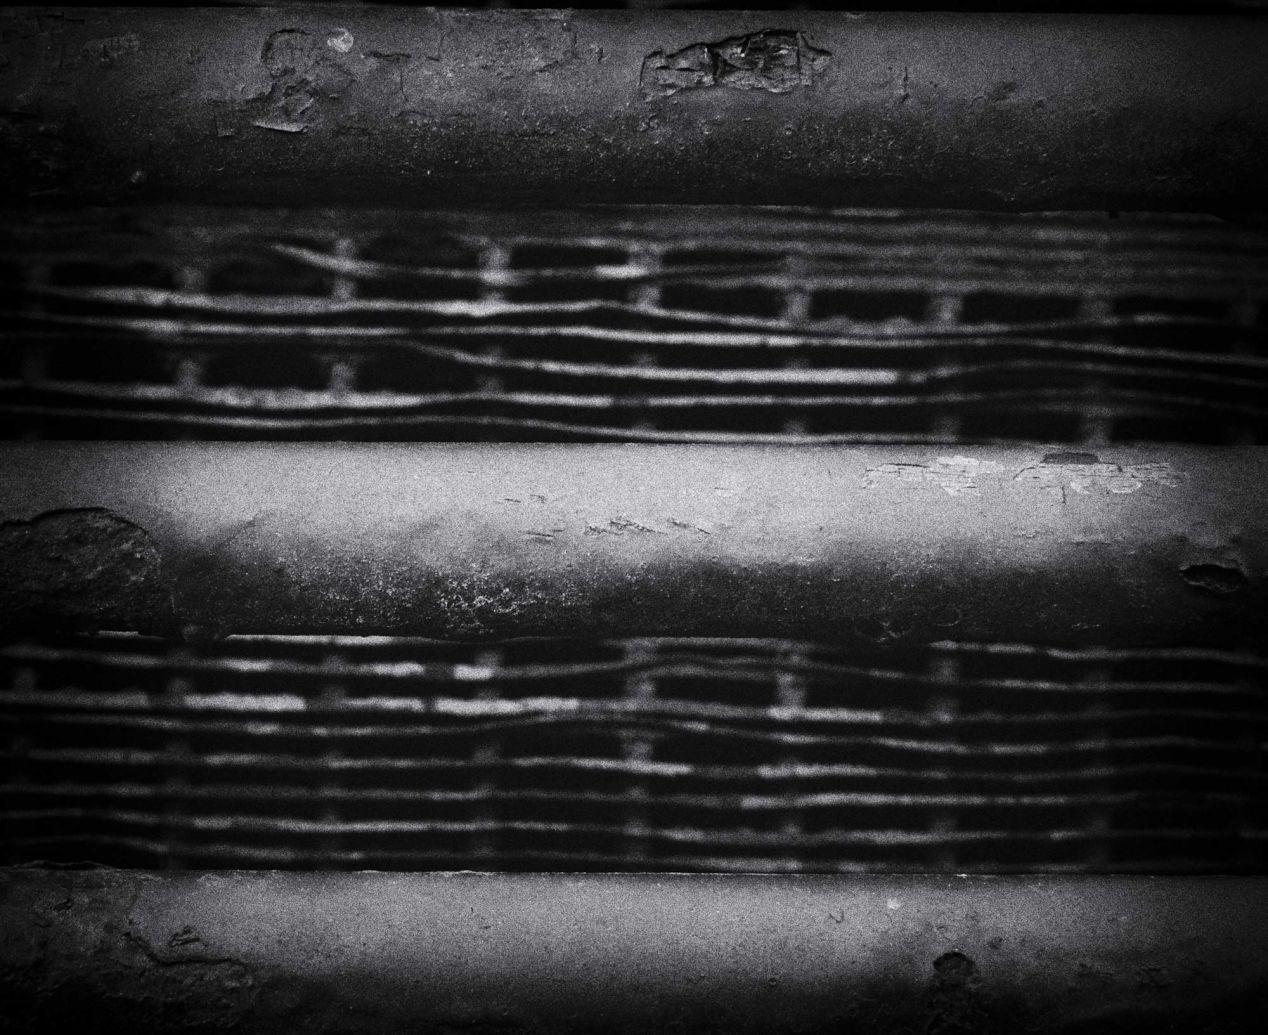 """Bars"" – shot on Ilford FP4+ with Mamiya RB67 and 90mm Sekor lens."